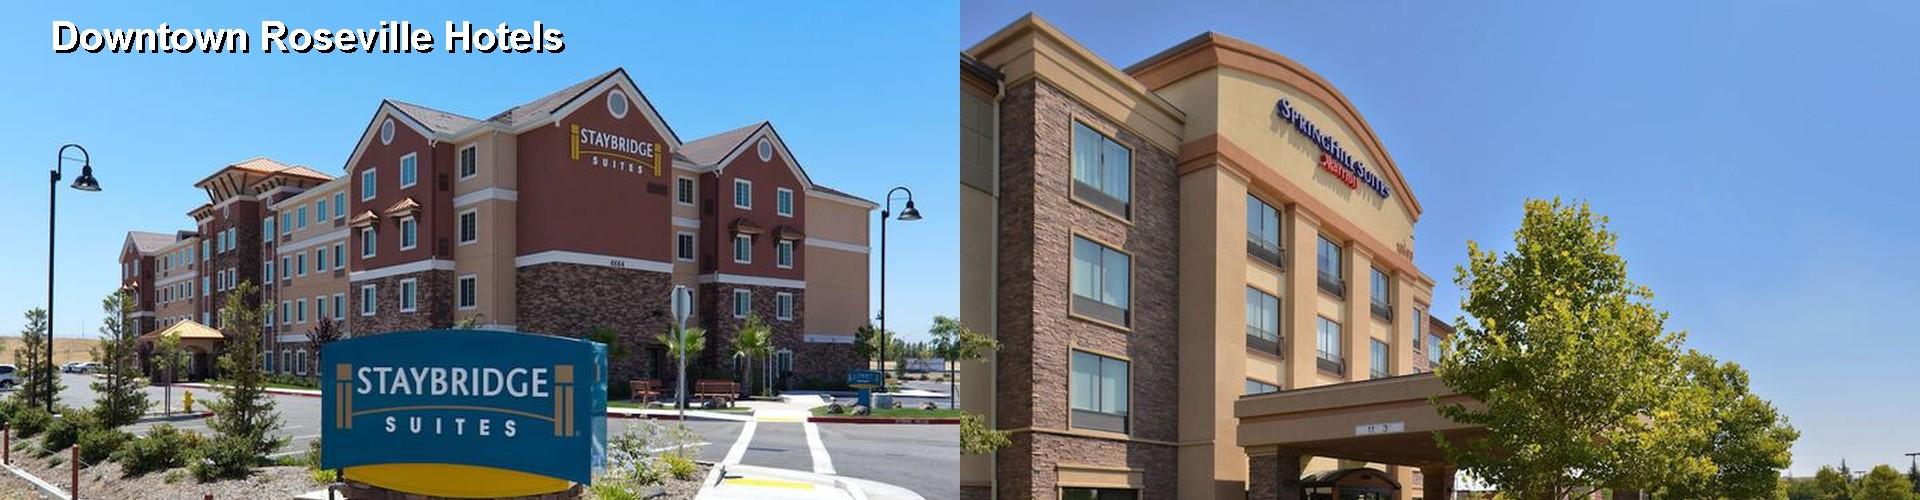 5 Best Hotels Near Downtown Roseville